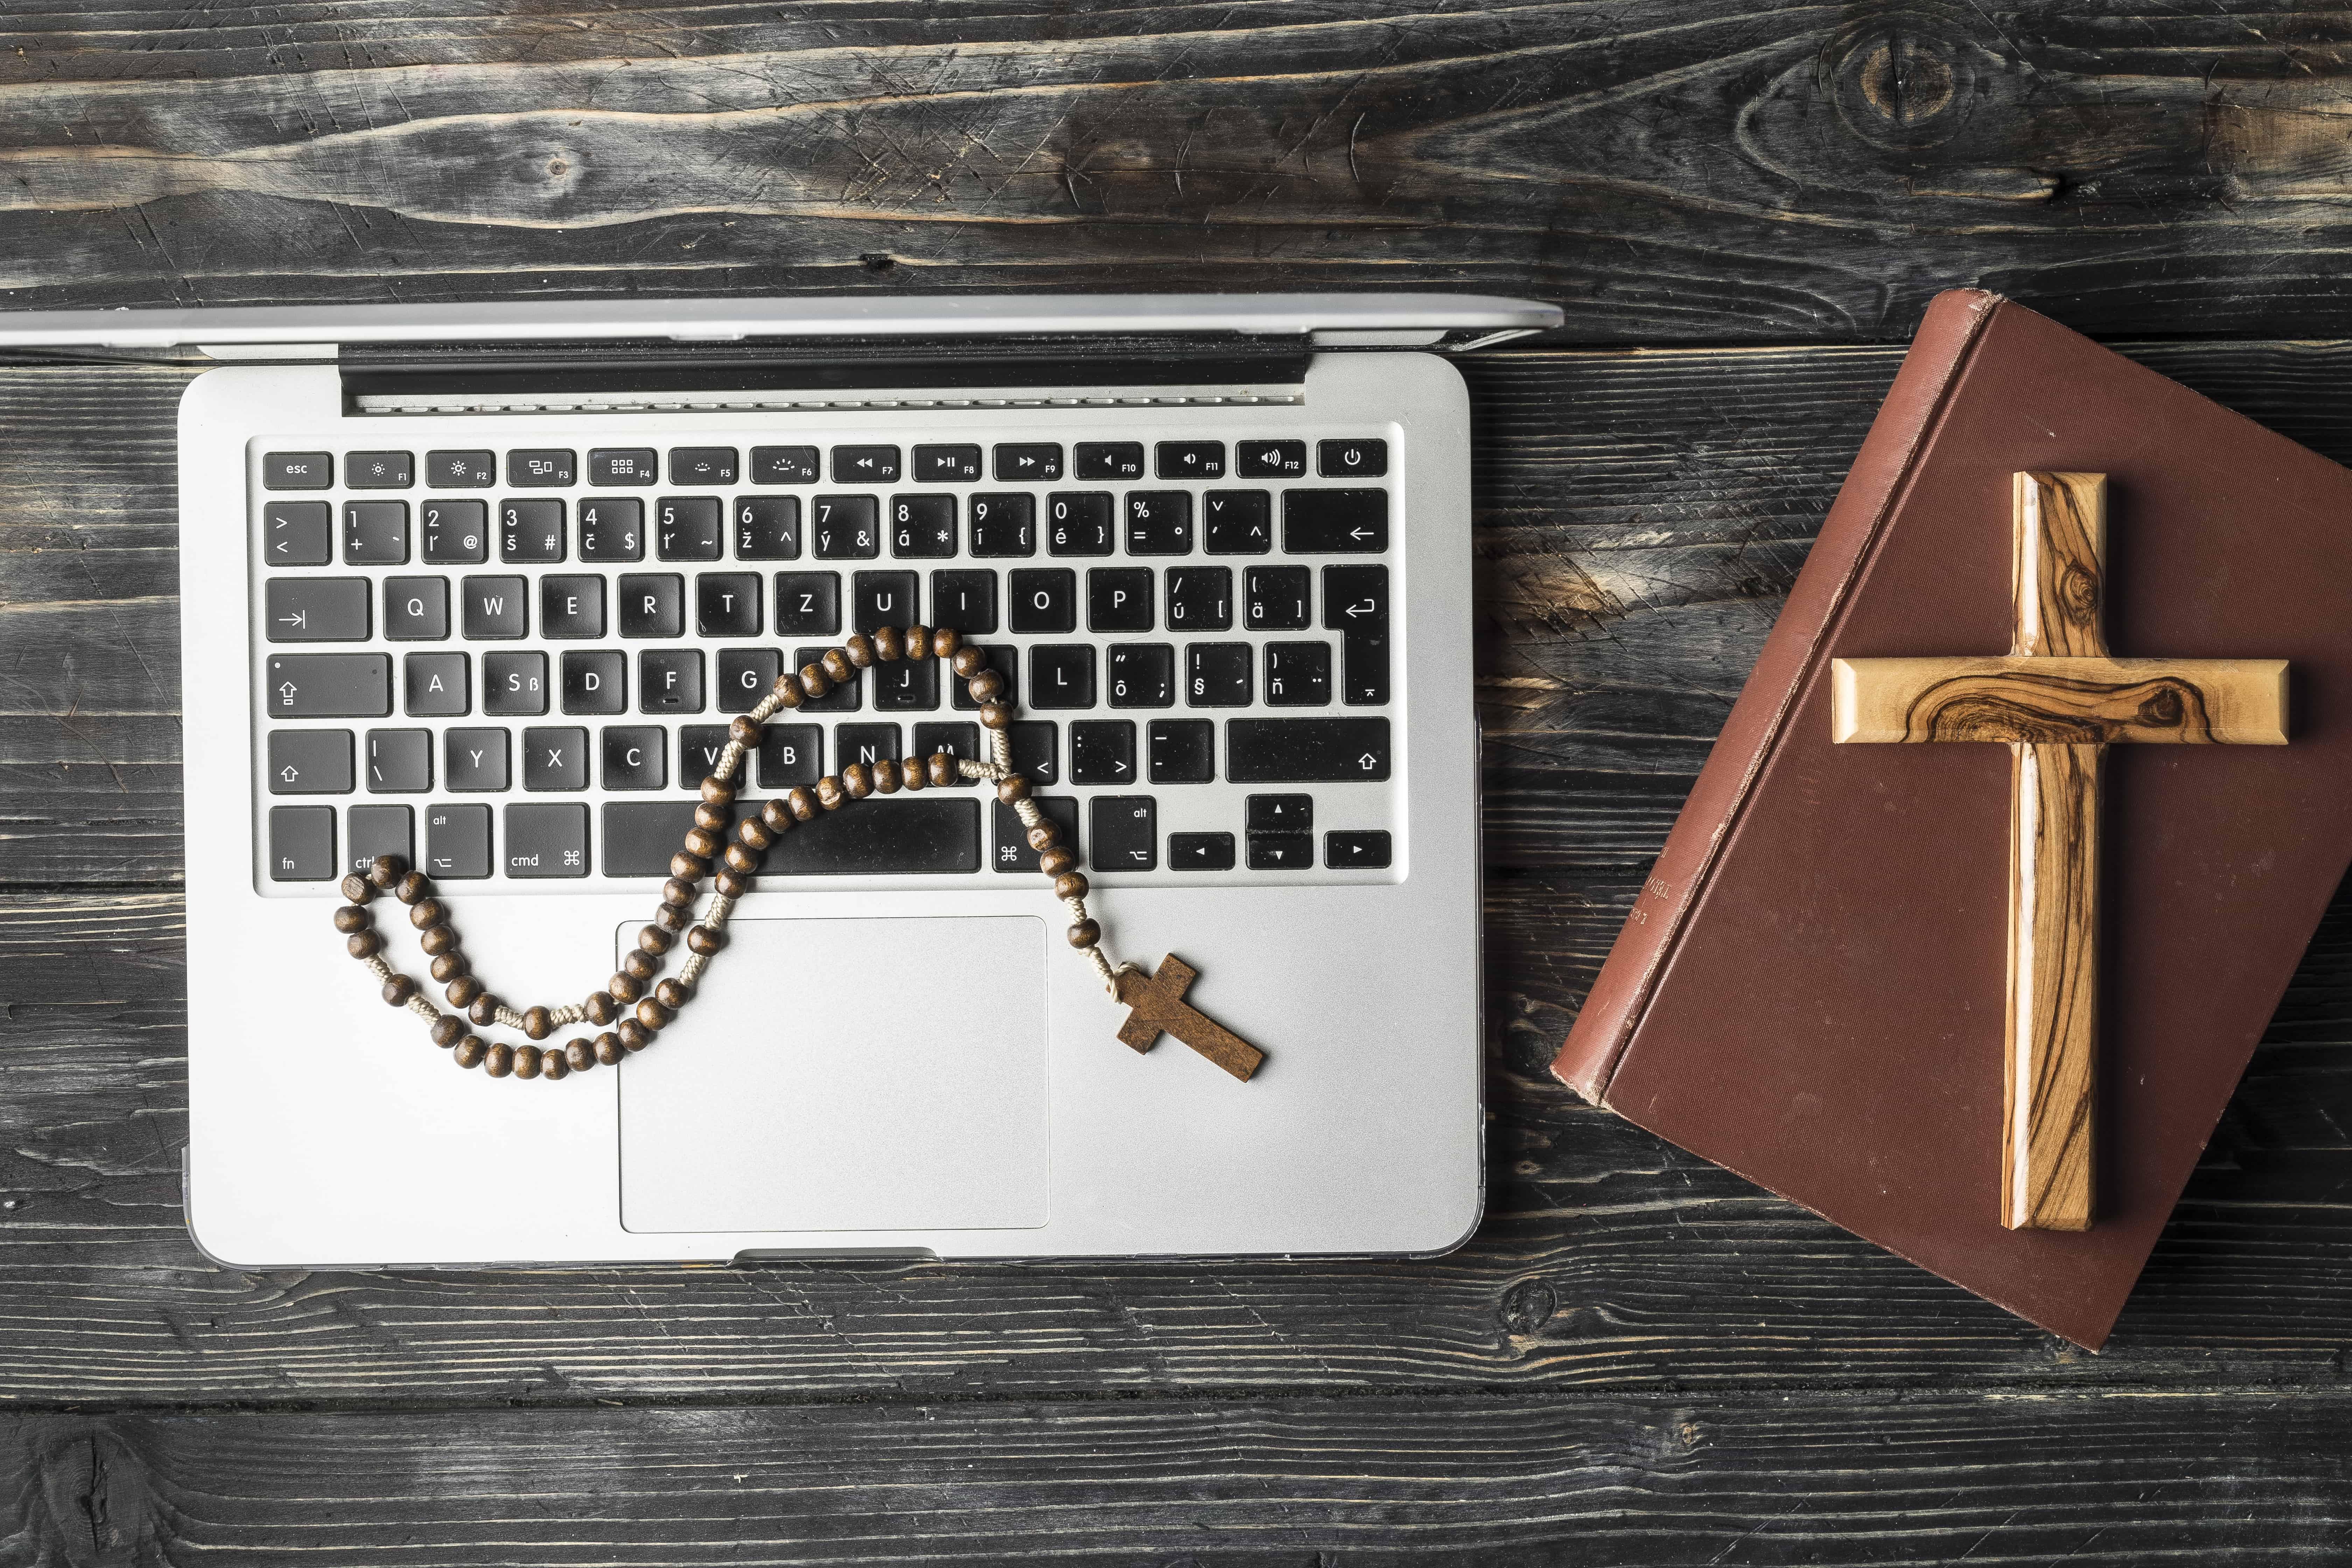 St John the Baptist Hybrid Computer